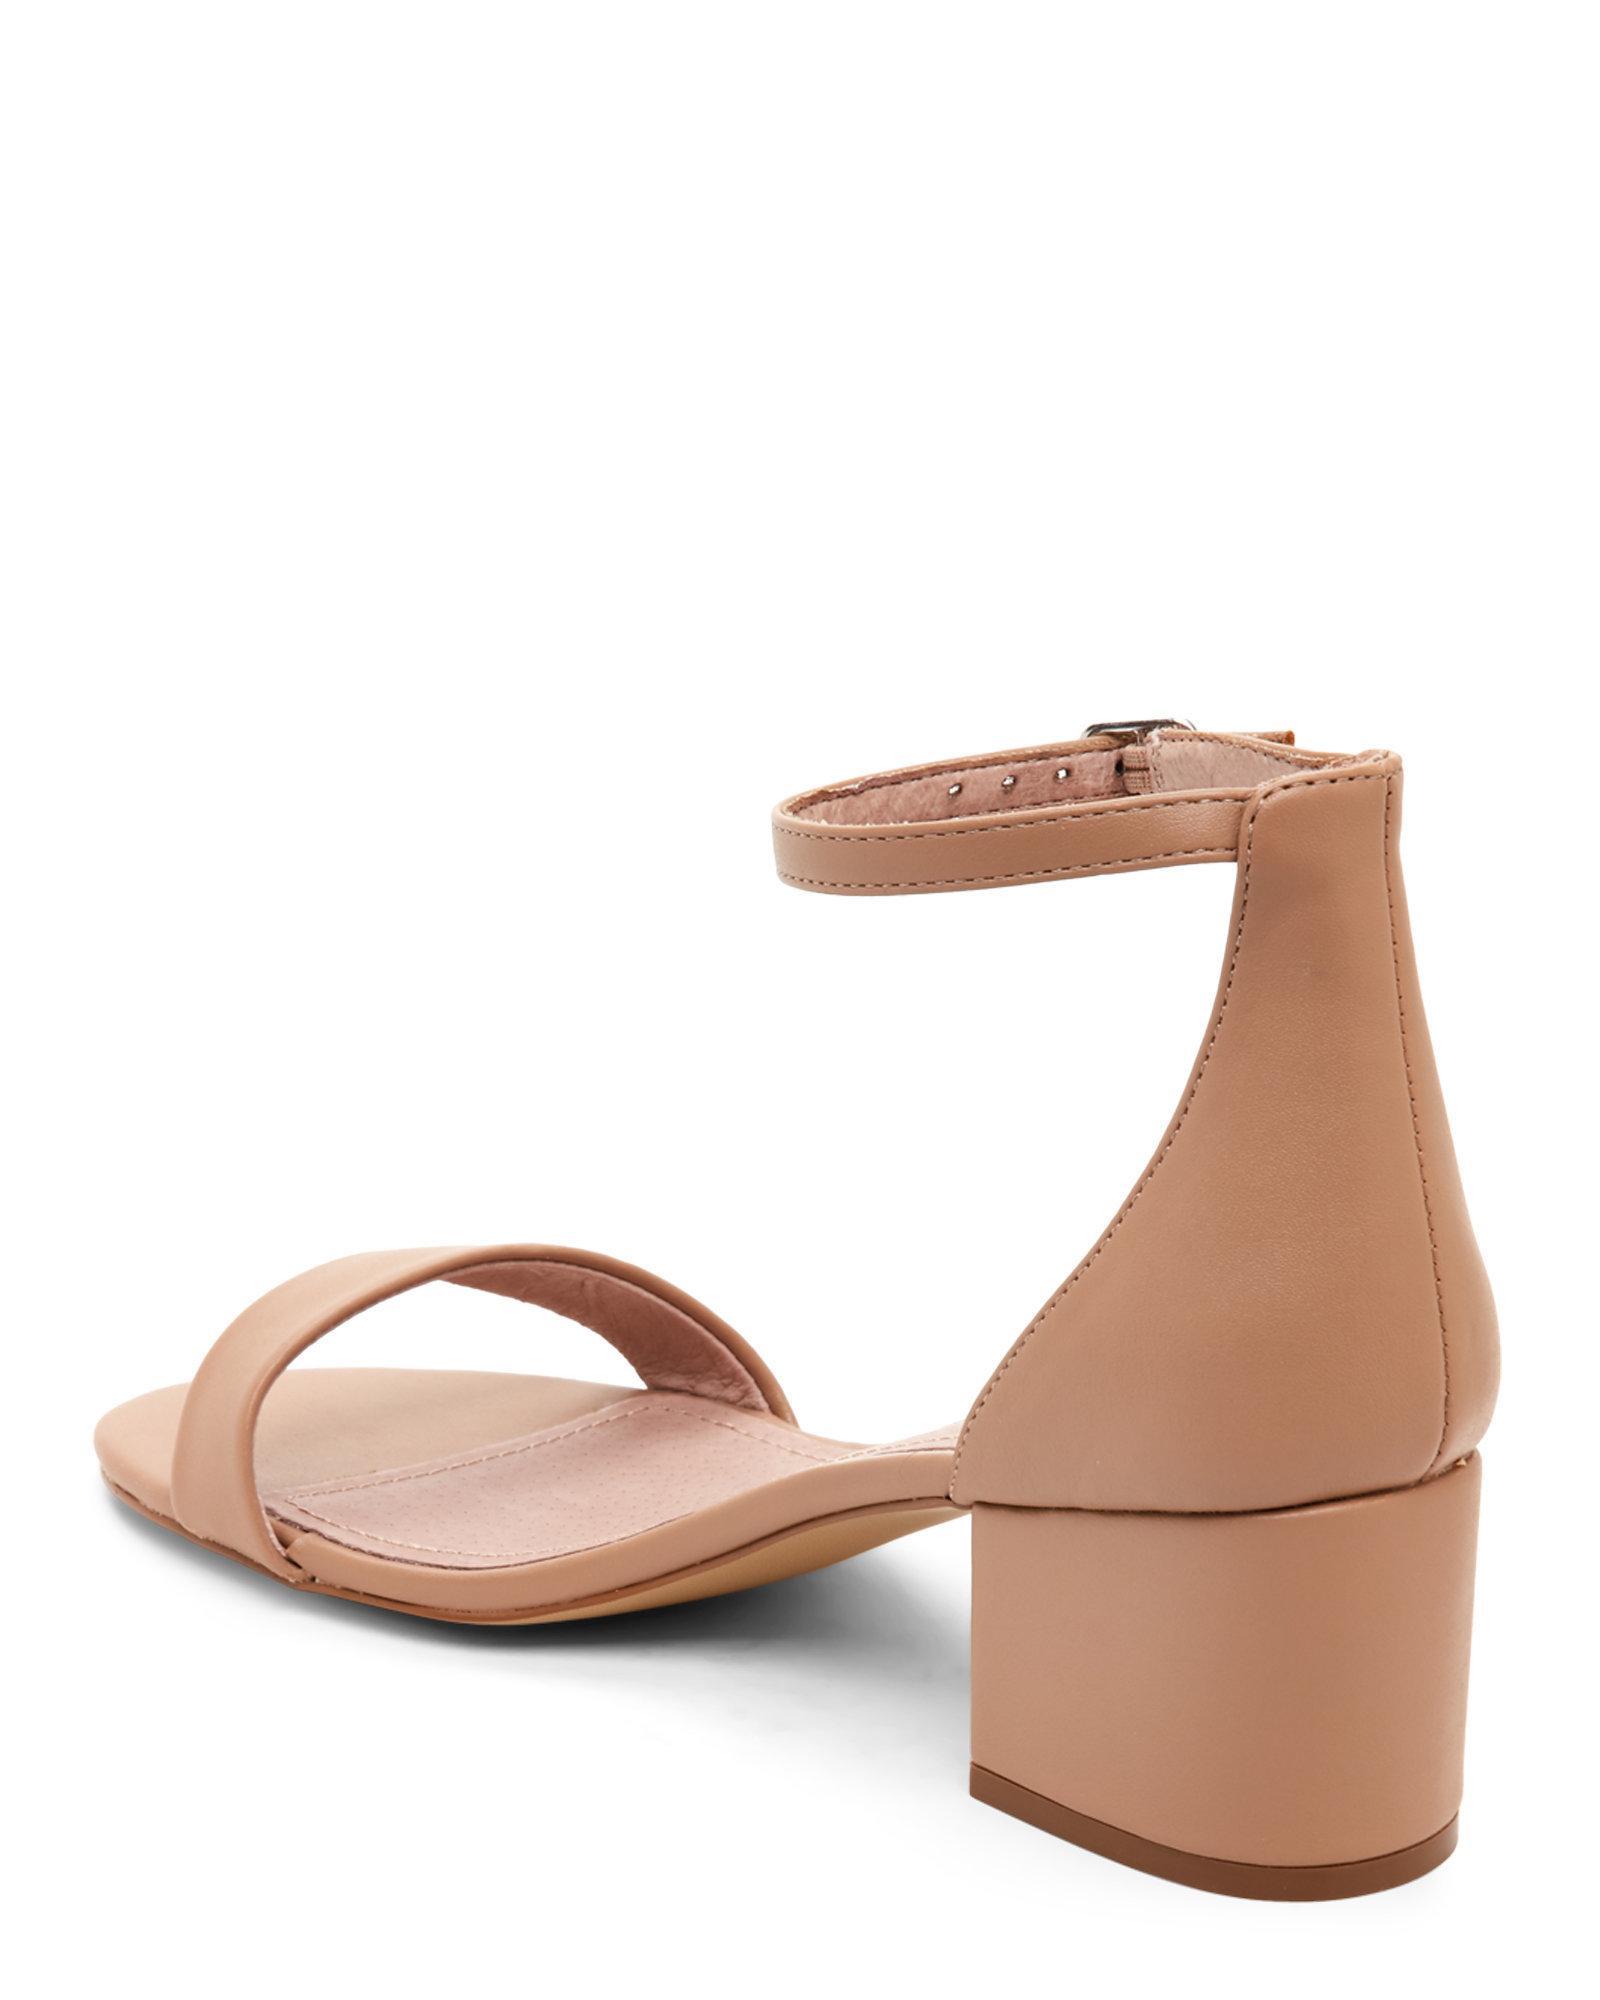 Lyst Steve Madden Blush Ireene Block Heel Two Piece Sandals